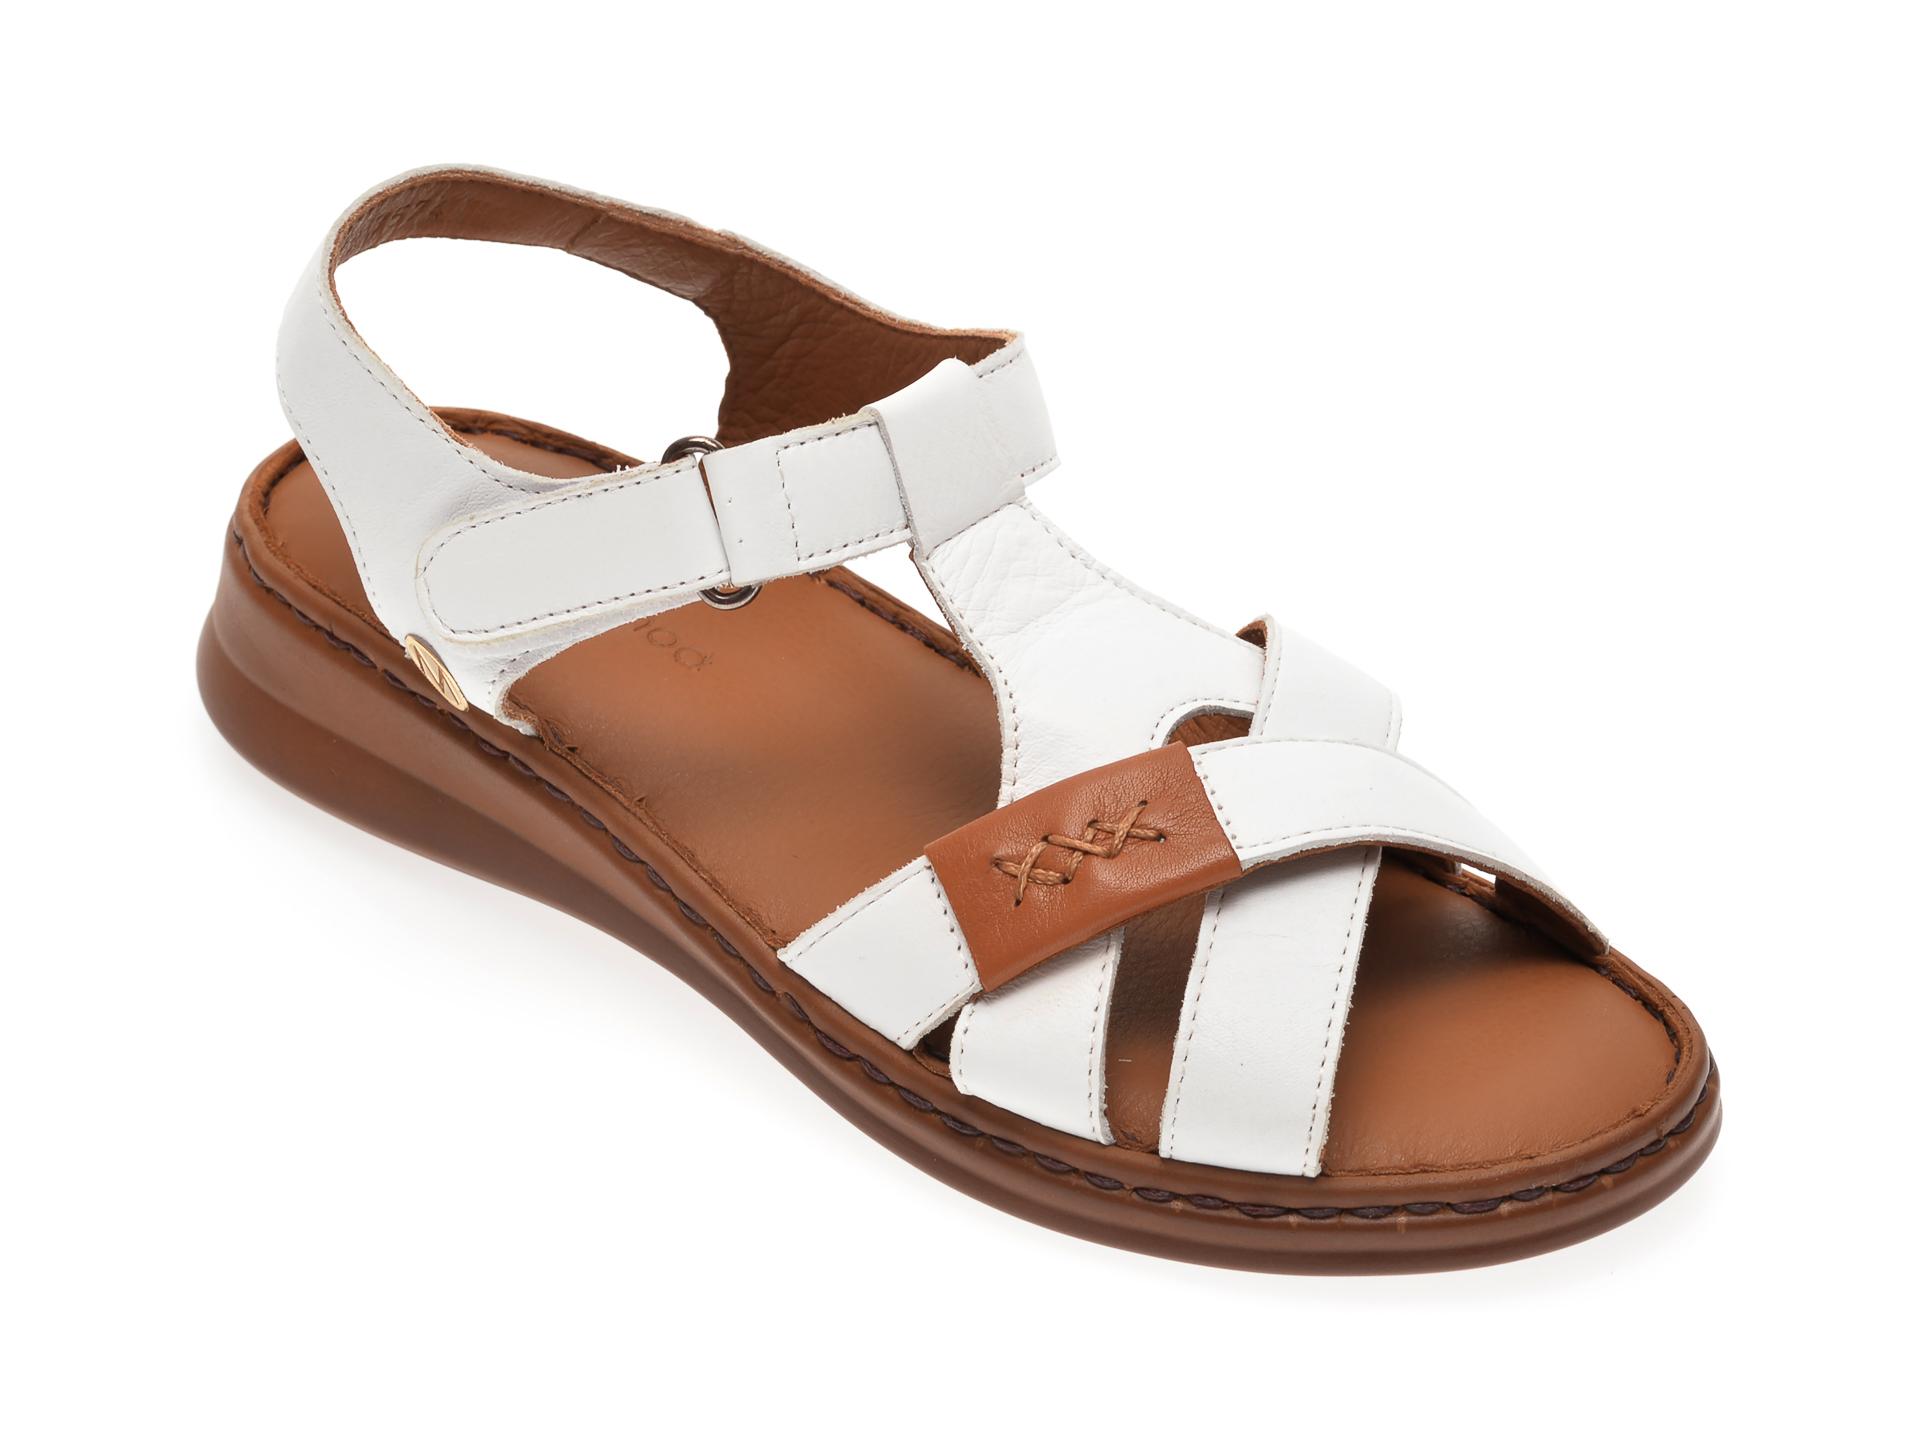 Sandale MESSIMODA albe, 20Y3574, din piele naturala imagine